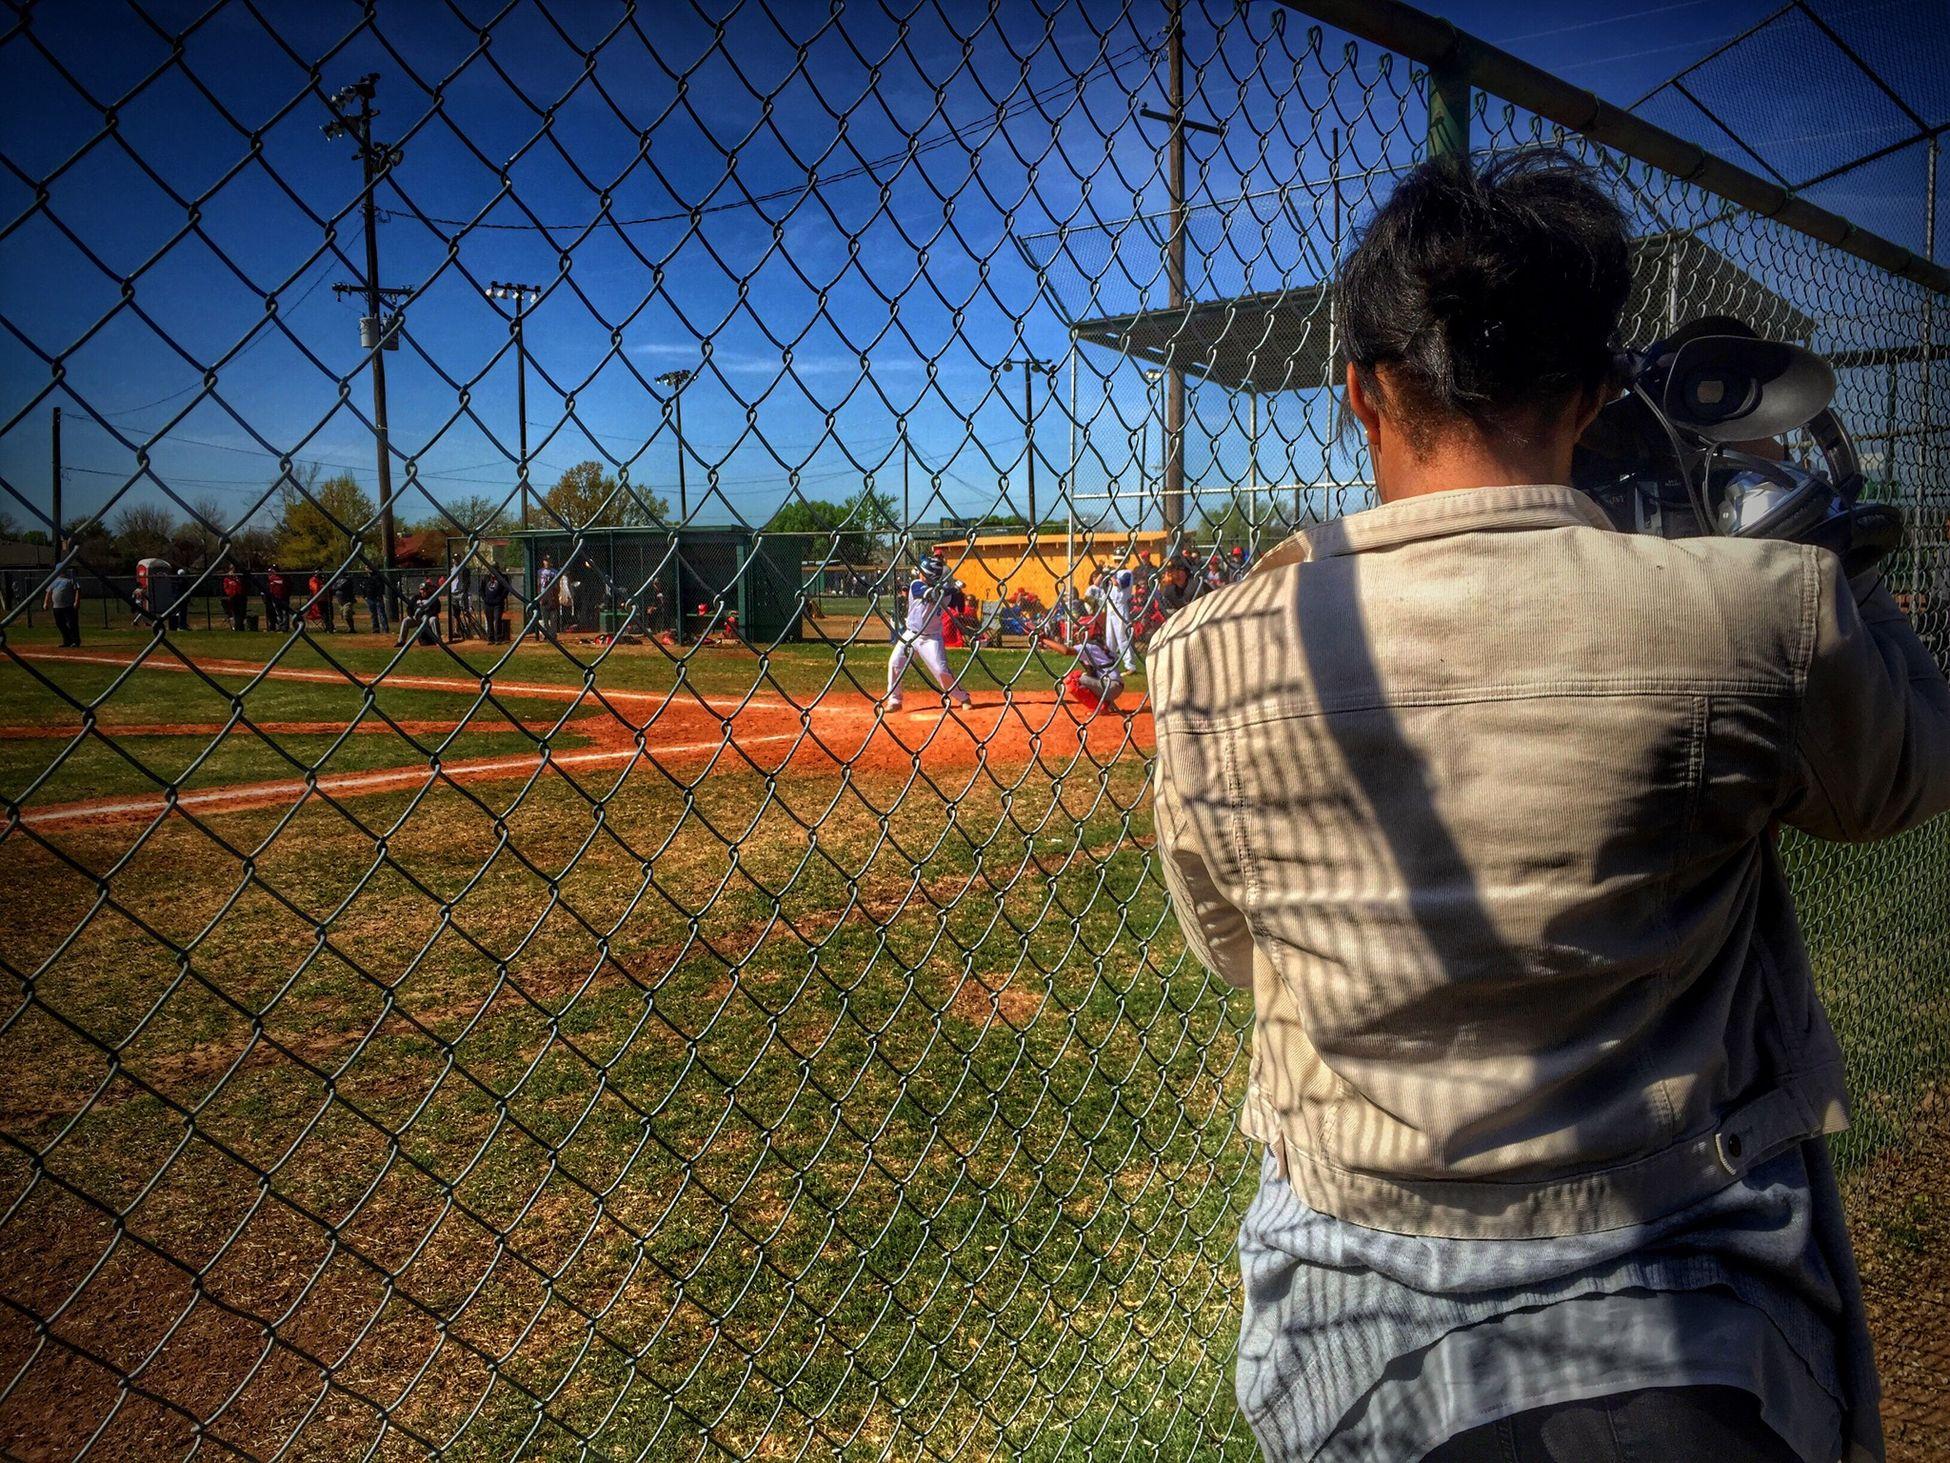 I'm capturing A friend capturing Shane at bat!! ⚾️❤️ Enjoying The Sun watching some Baseball